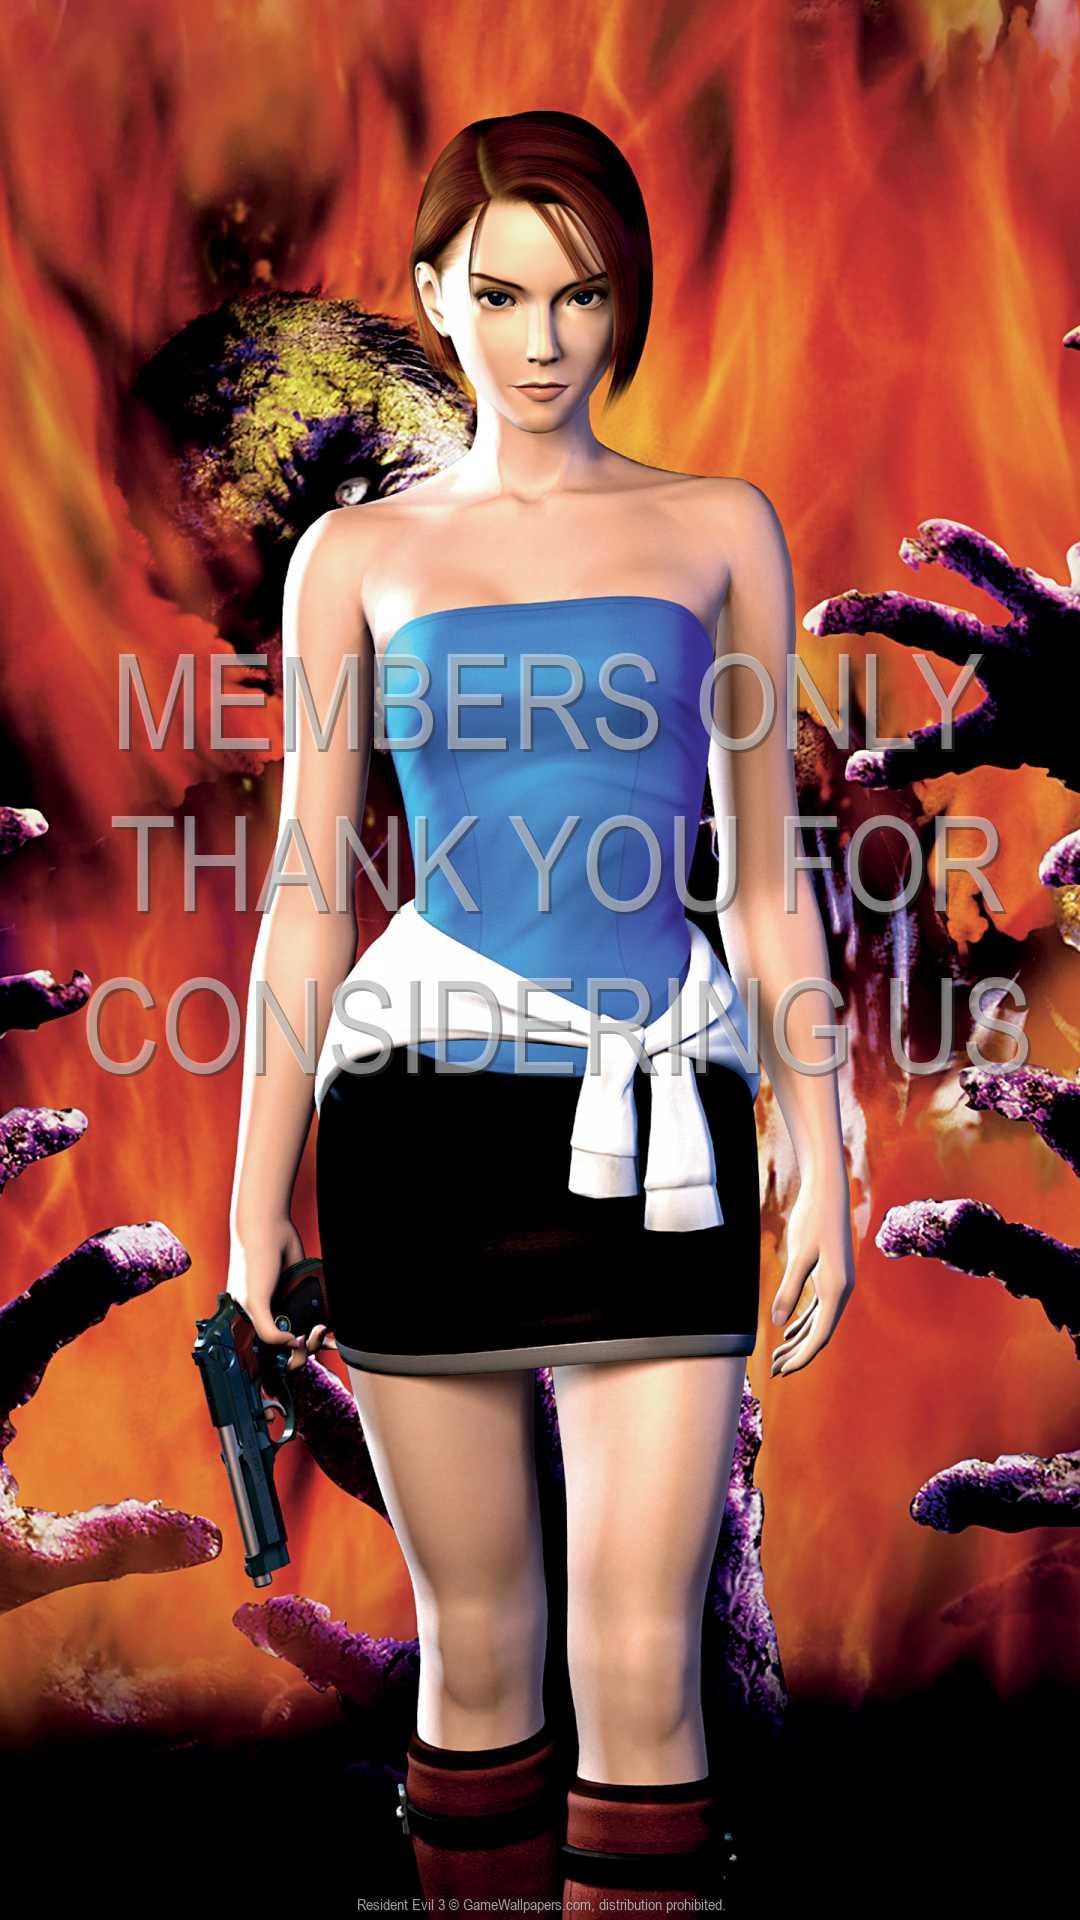 Resident Evil 3 1080p Vertical Mobile wallpaper or background 06